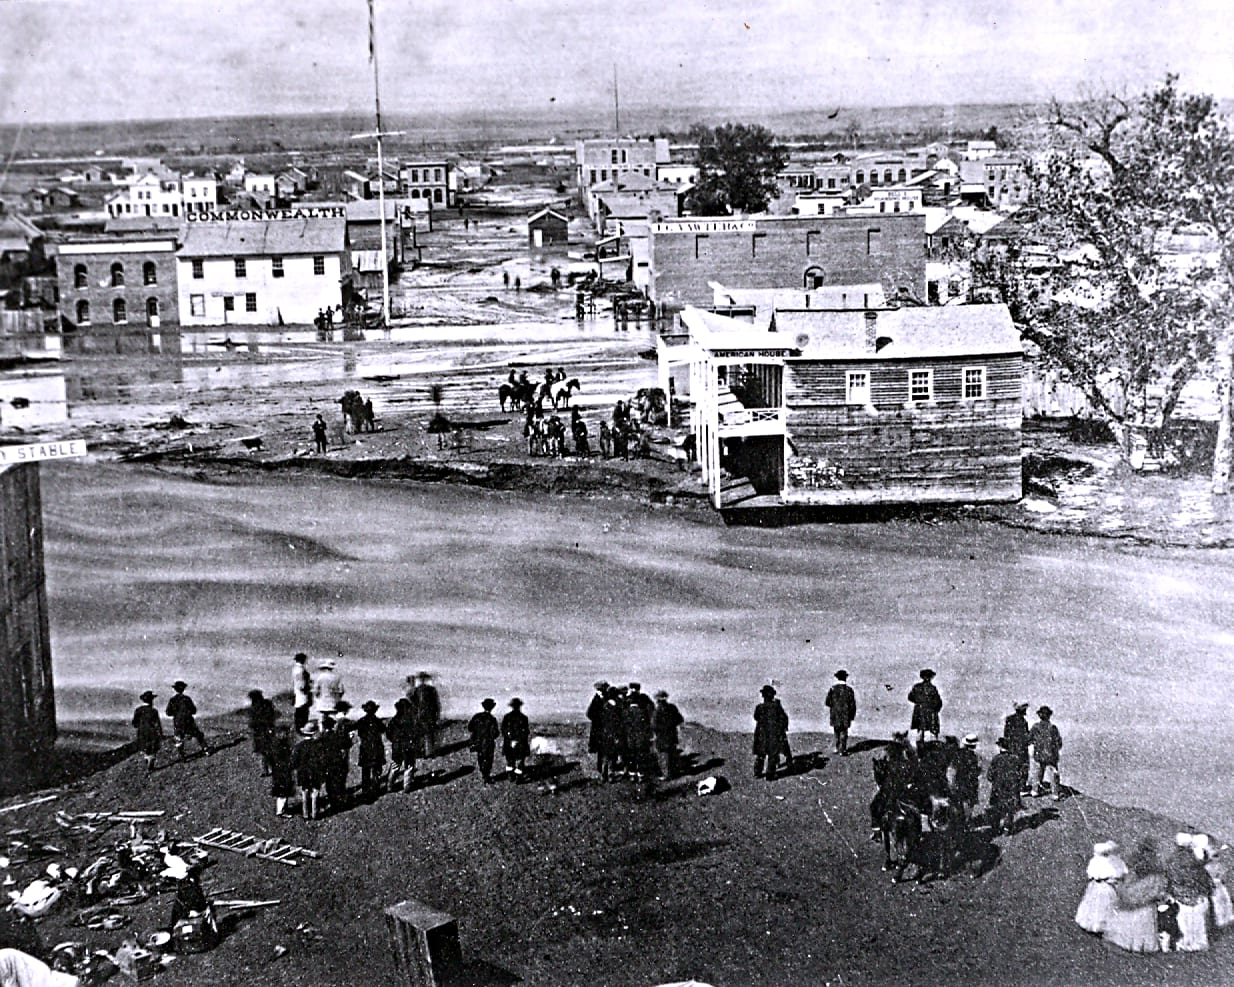 Auraria, Colorado Cherry Creek Flood of 1864